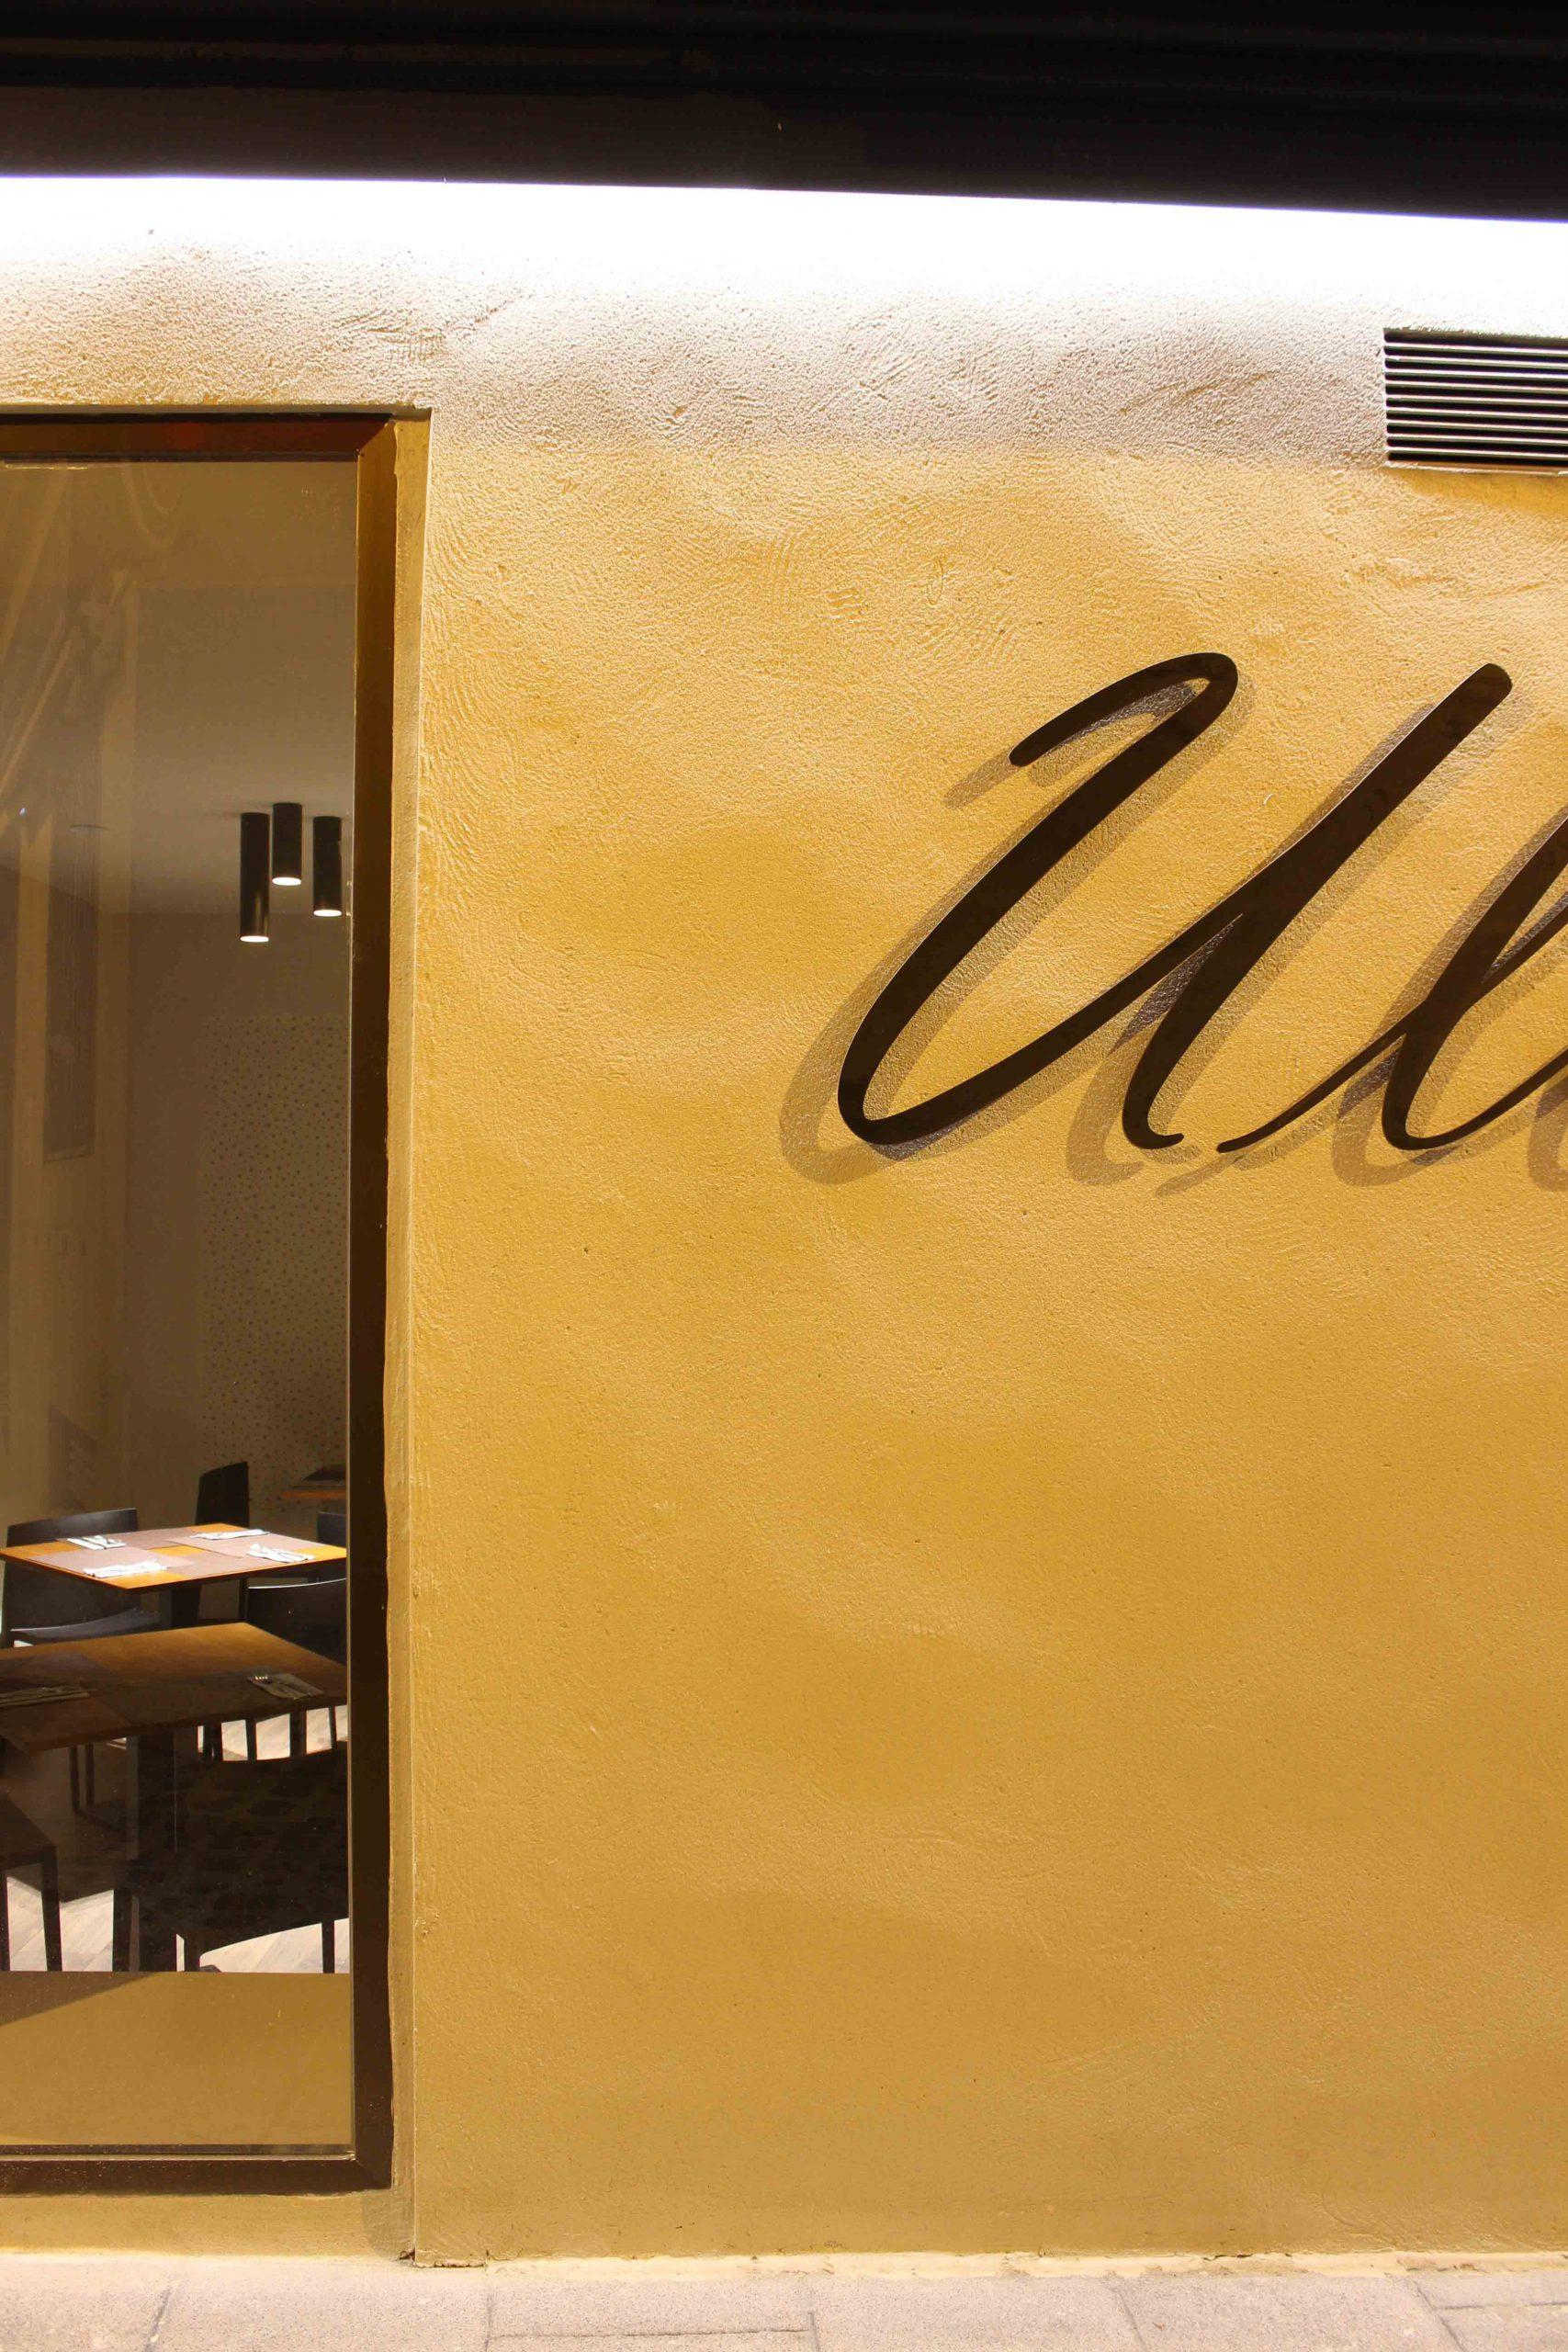 http://gustavolahera.com/wp-content/uploads/2020/11/Foto-2-Restaurante-Ullate-scaled.jpg